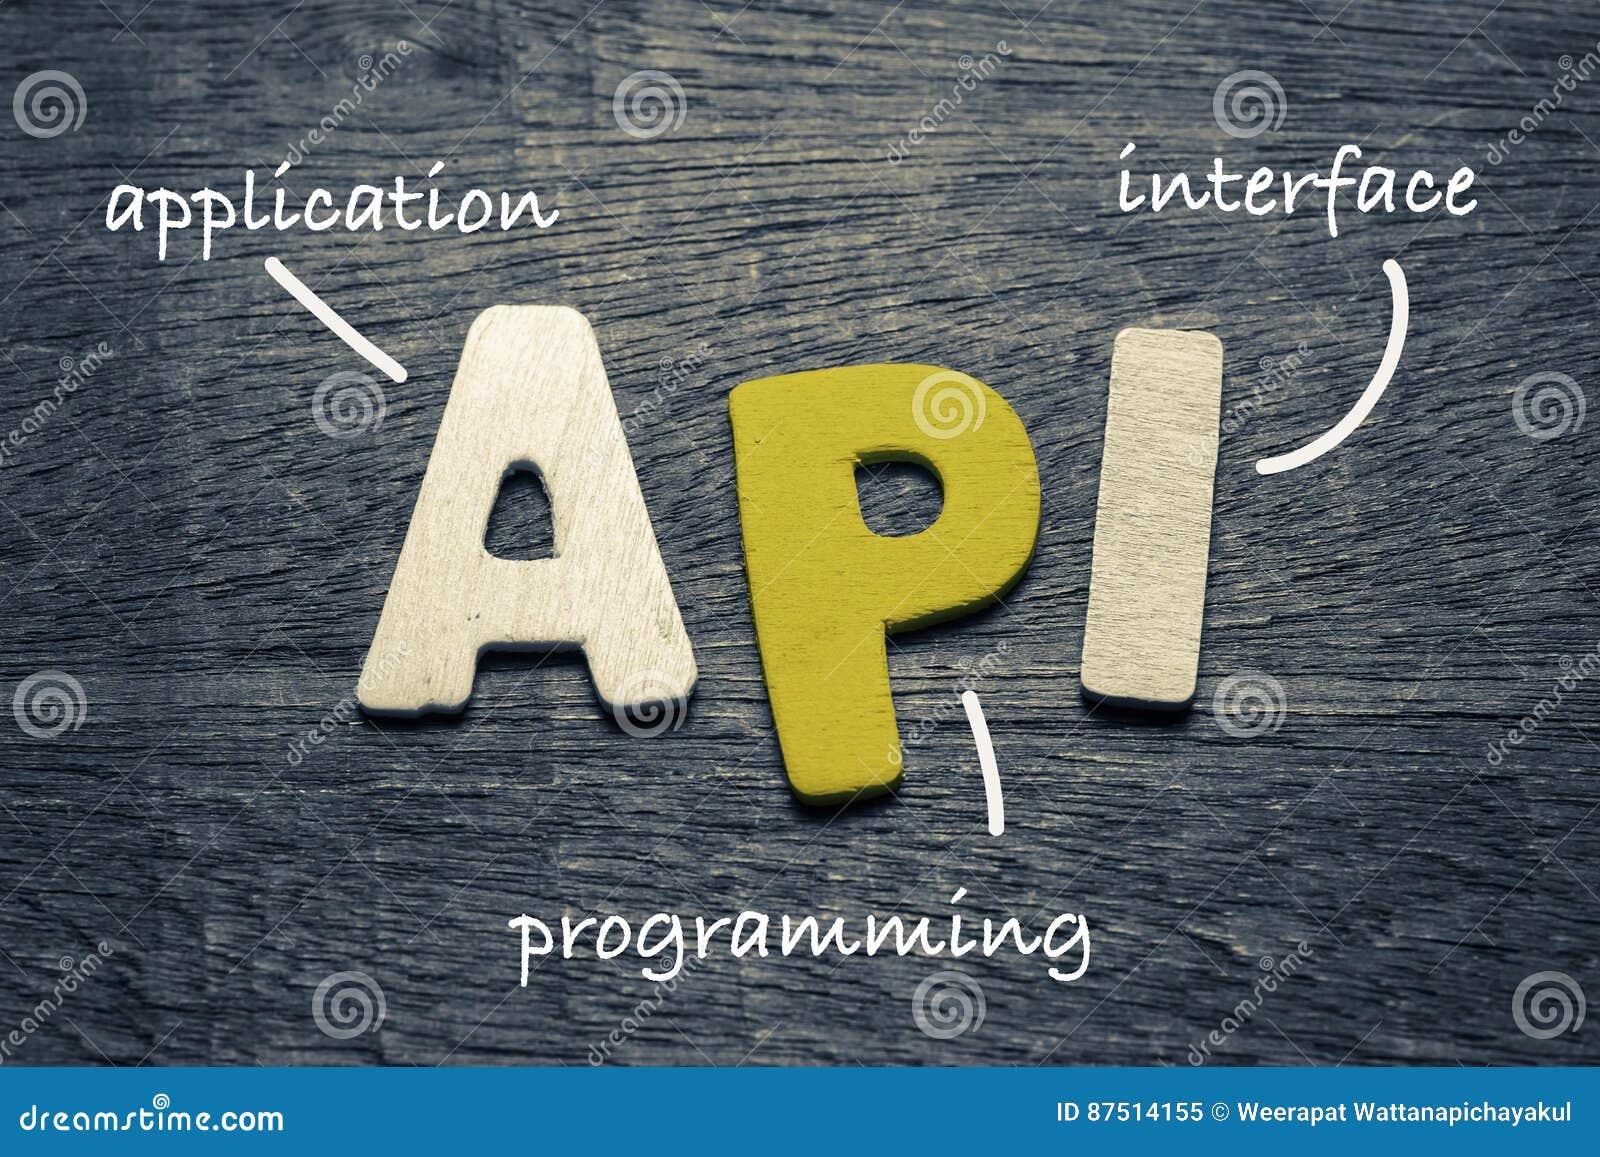 API Application Program Interface Stock Image - Image of